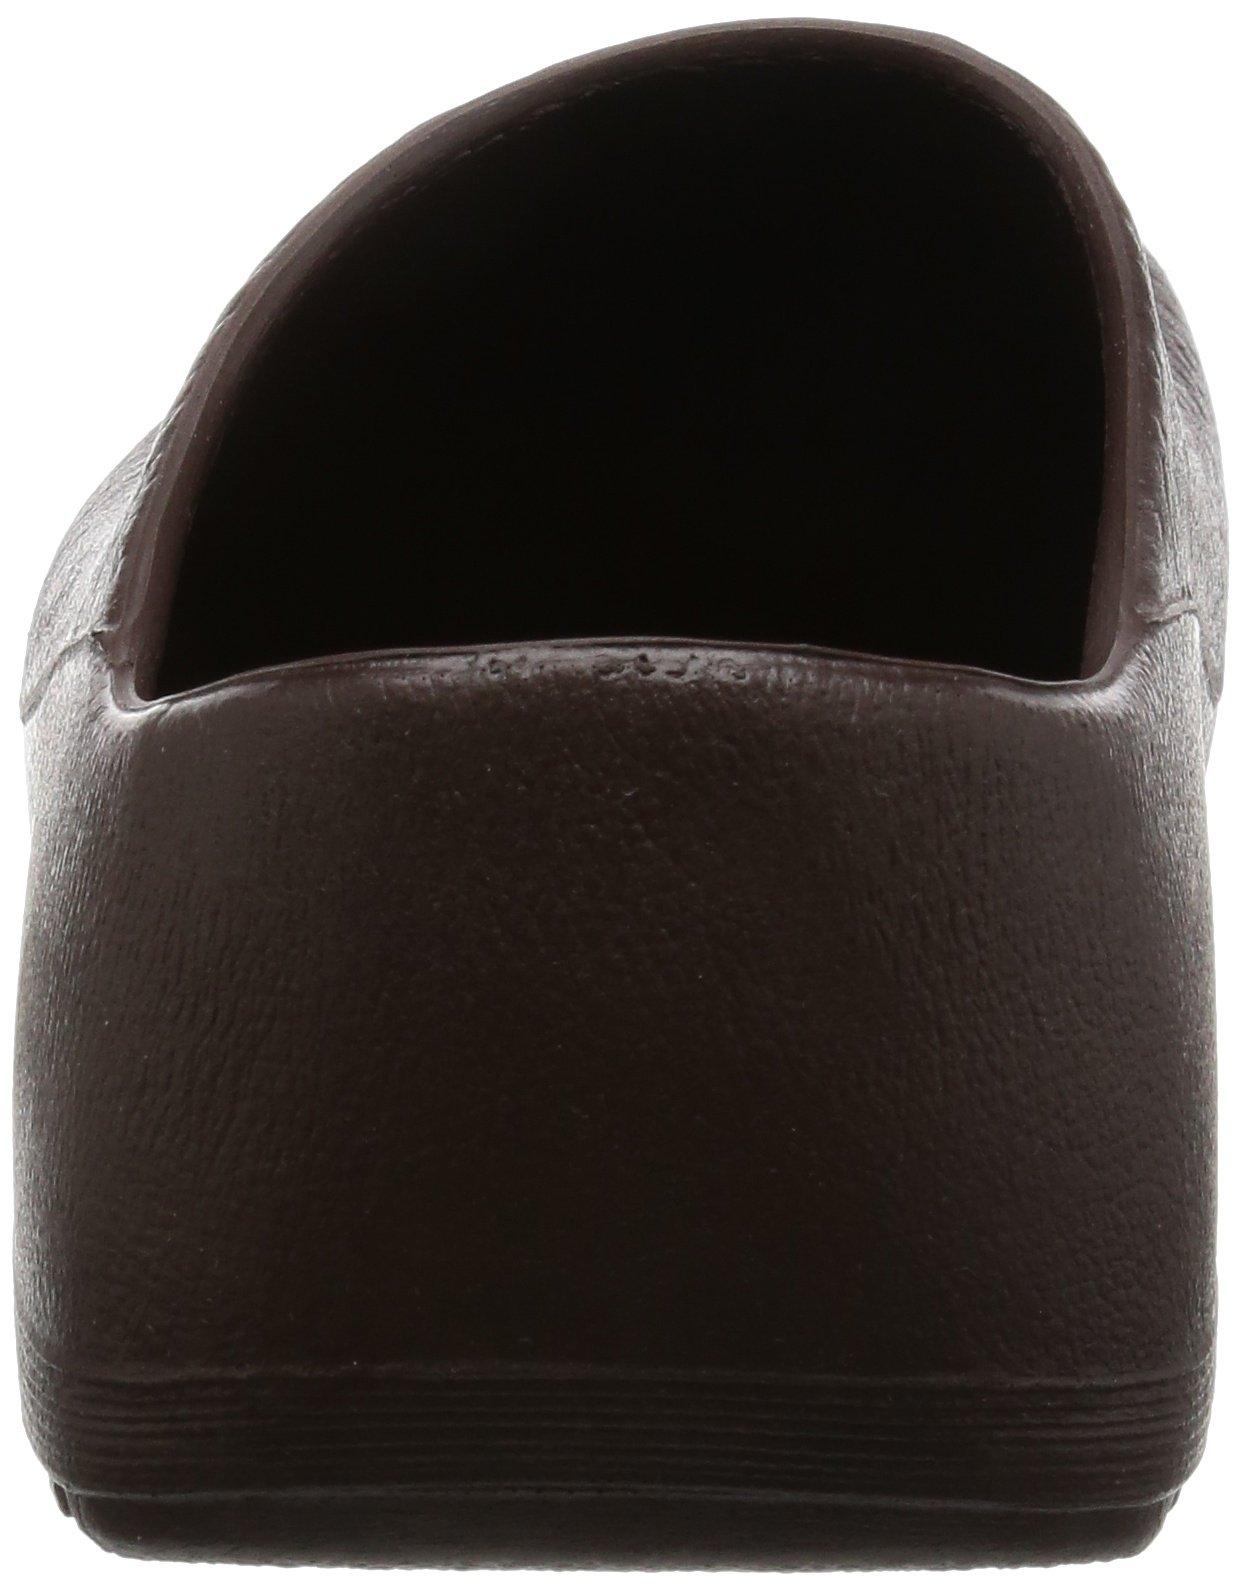 Birkenstock Men´s Profi-Birki Brown Alpro-Foam Sandals 40 EU (M7/L9 US) R 074061 by Birkenstock (Image #2)